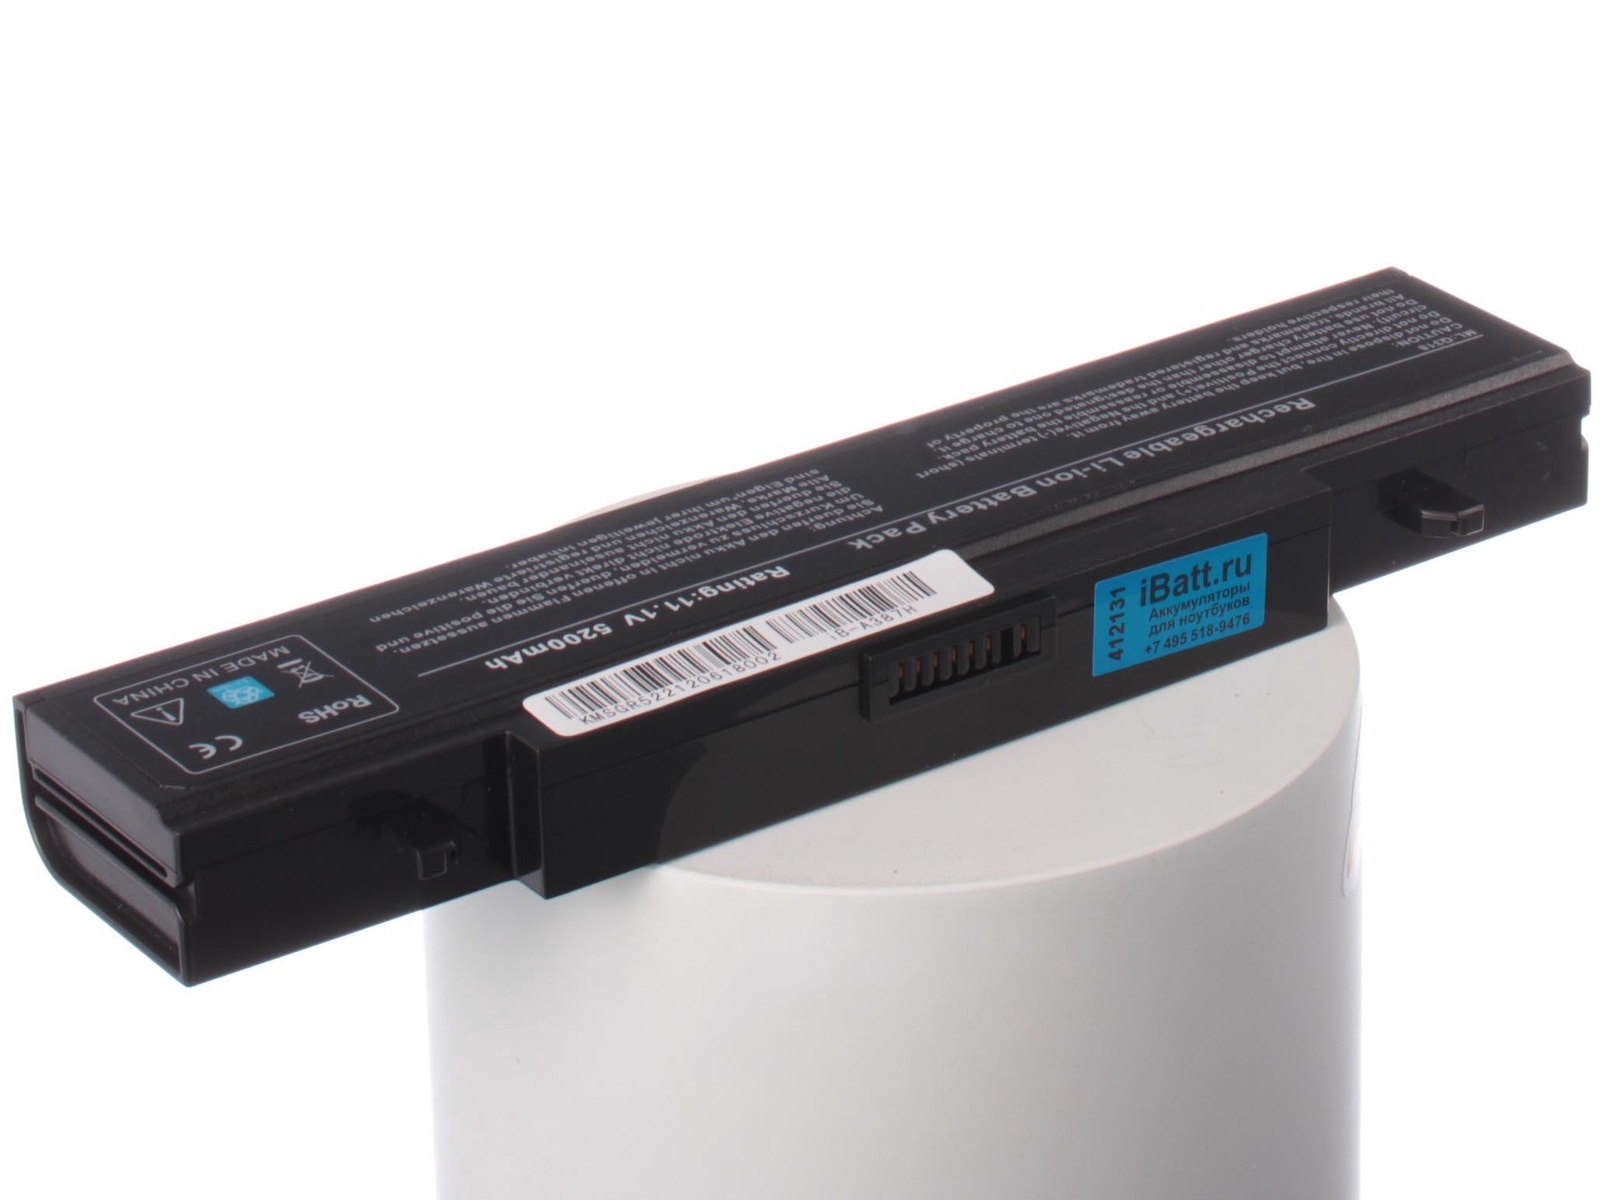 Аккумулятор для ноутбука iBatt для Samsung ATIV Book 2 270E5V, NP-R480, NP-RV410L, R525-JV06, RV520-S0A, RV709, NP270E5E-X05, R540-JS05, RC510-S04, RC530-S09, RF511-S03, RV410-A02, RV520-S08, RV718, 300E5A-S01, 300E7A-S05 аккумулятор для ноутбука anybatt для samsung rc530 s09 rf511 s03 rv410 a02 rv520 s08 rv718 np270e5e x02 rf710 s04 r440 jt03 r730 ja06 r780 js09 rv410 s01 rv511 s02 rv711 a01 r780 js02 rf712 s01 np270e5e k02